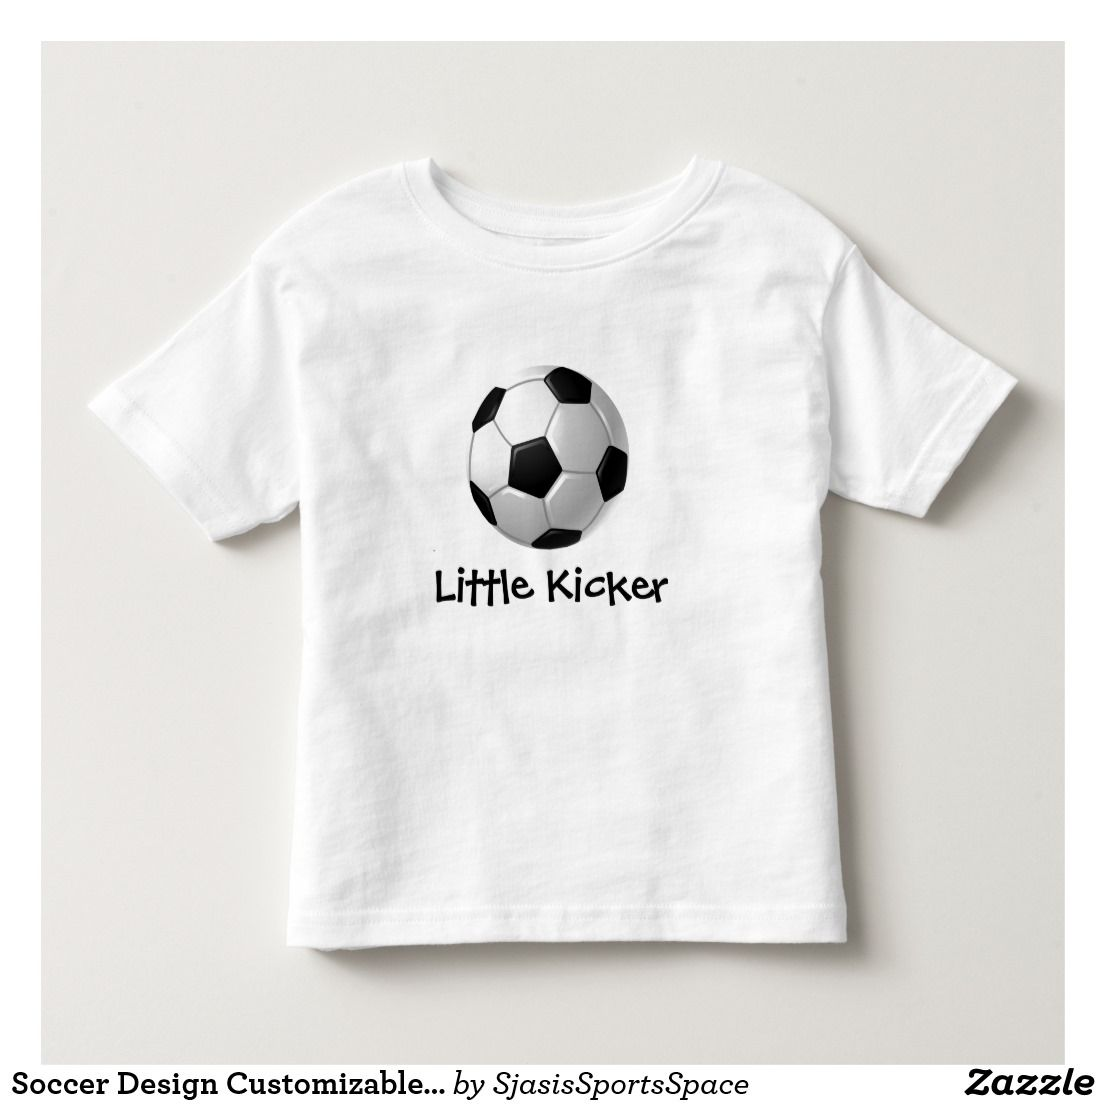 Zazzle t shirt design size - Soccer Design Customizable Kids Clothing Toddler T Shirt